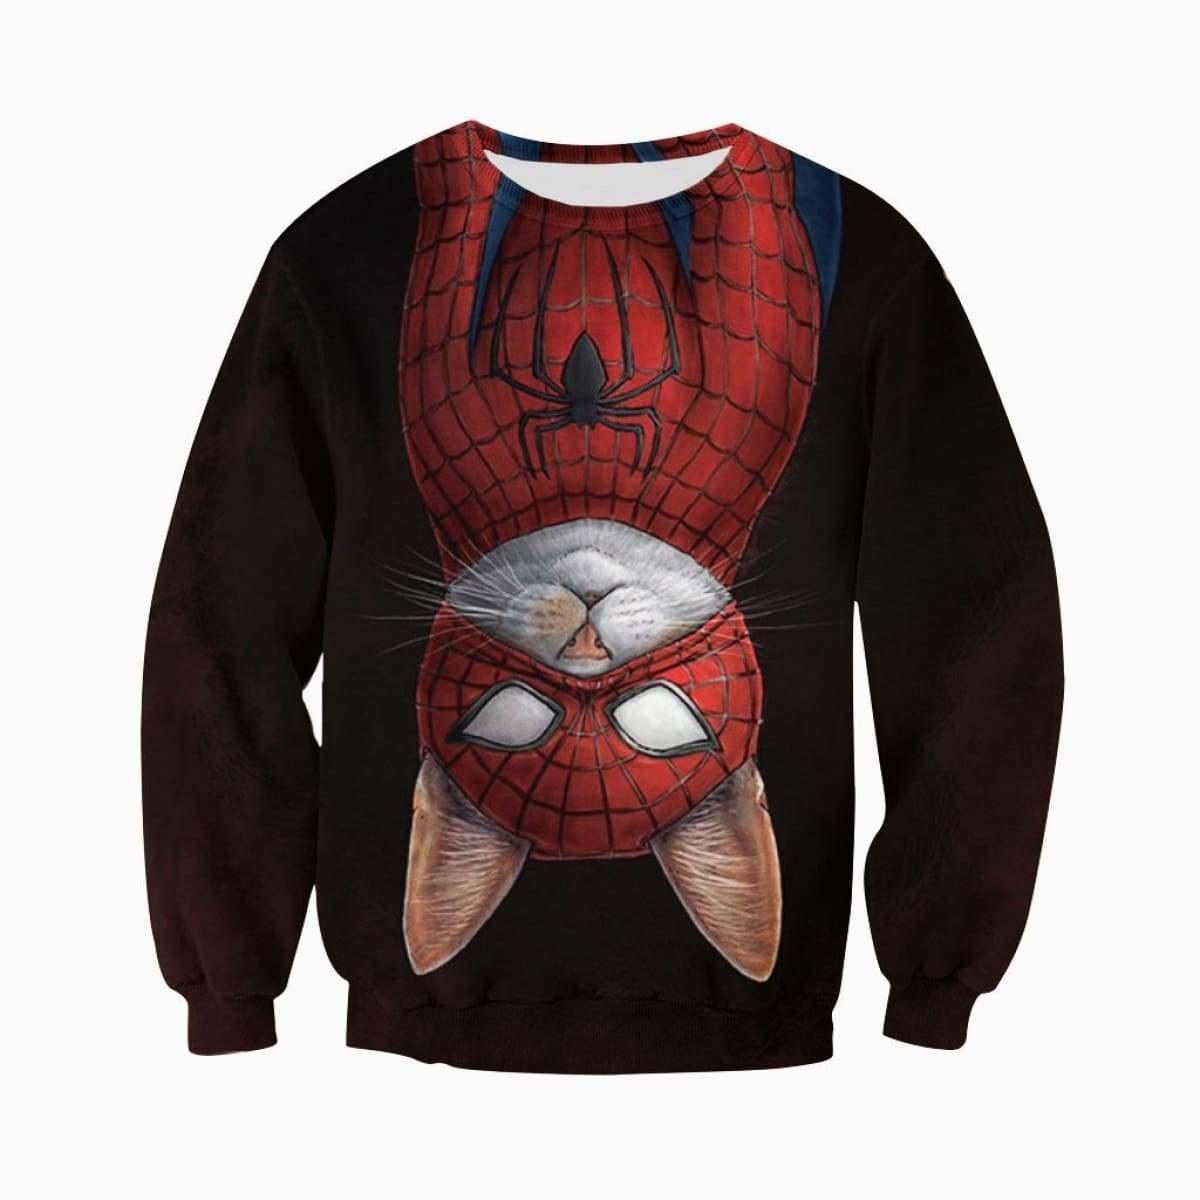 Spider-cat all over printed sweatshirt